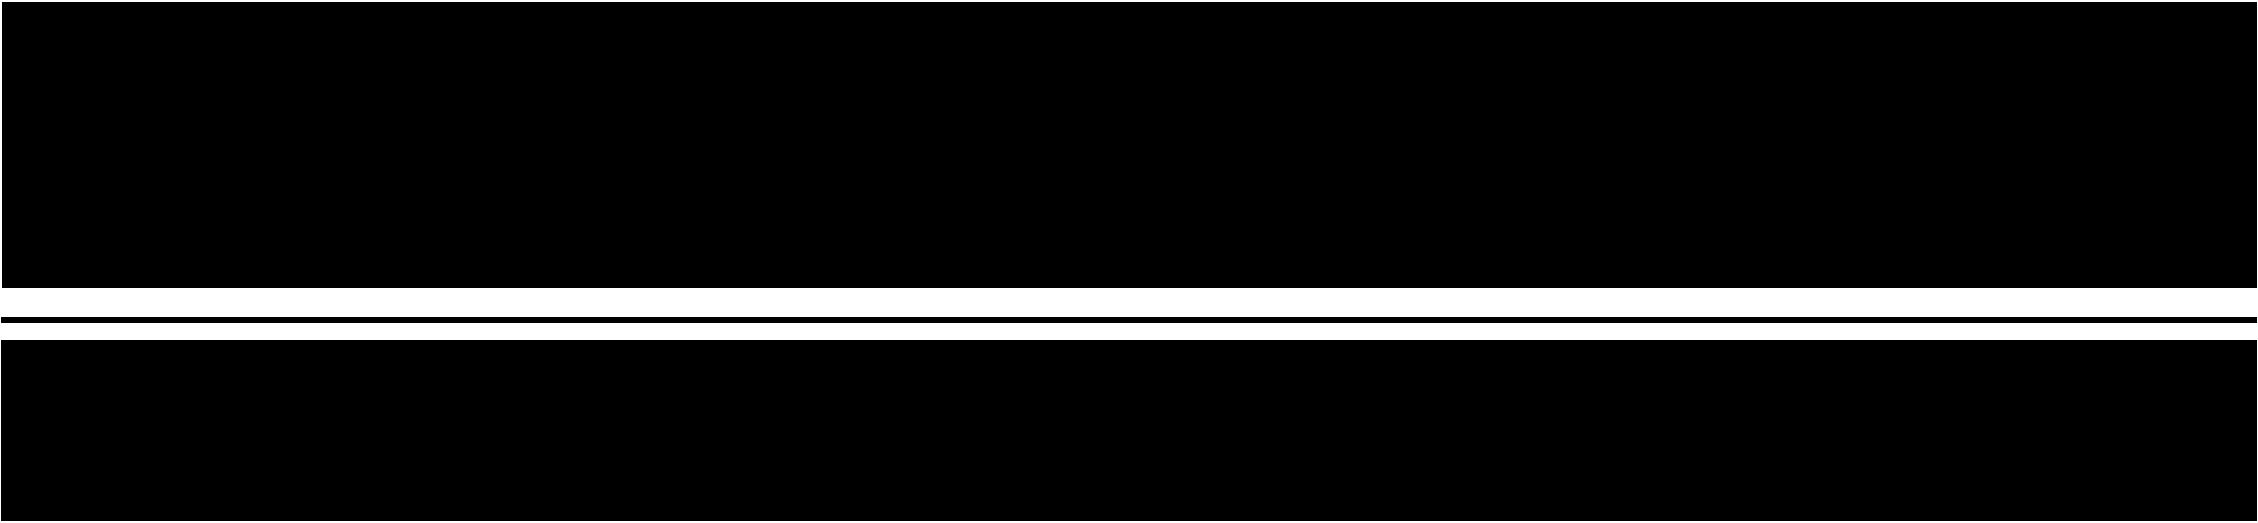 OLIVER MEIBERT